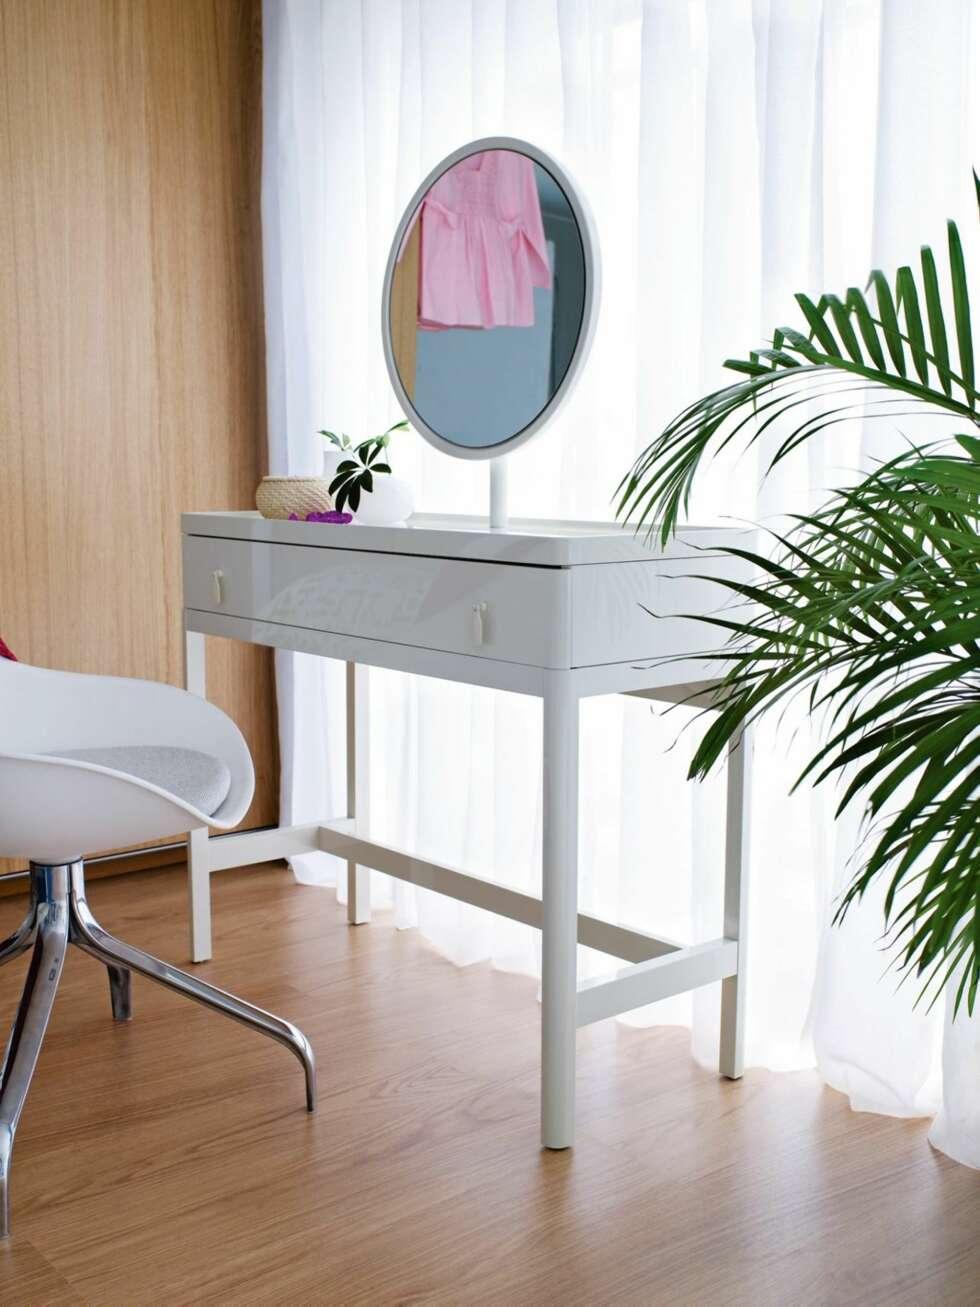 for deg som vil sove bolig. Black Bedroom Furniture Sets. Home Design Ideas